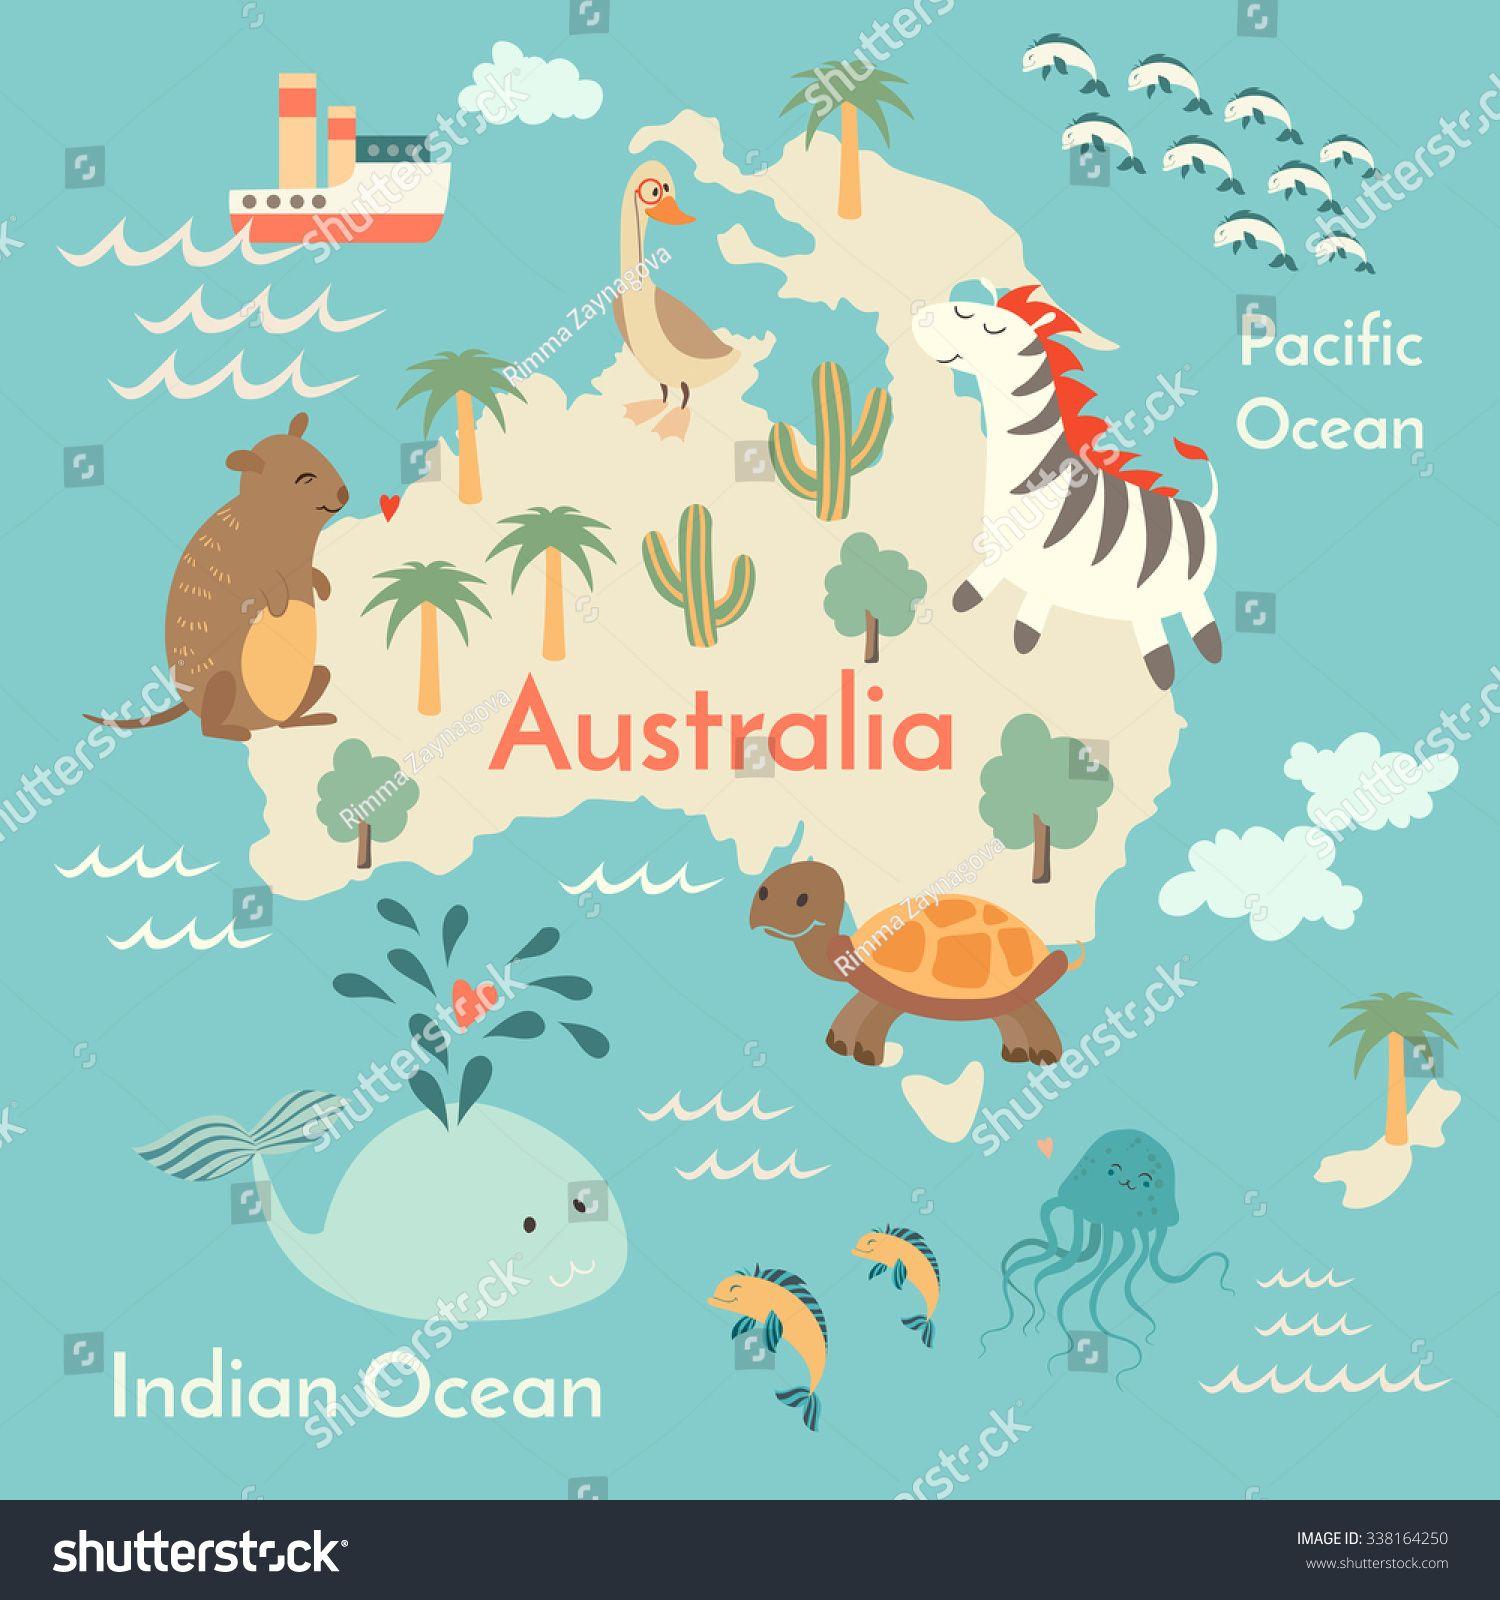 animals world map australiaaustralia map for childrenkids australian animals poster